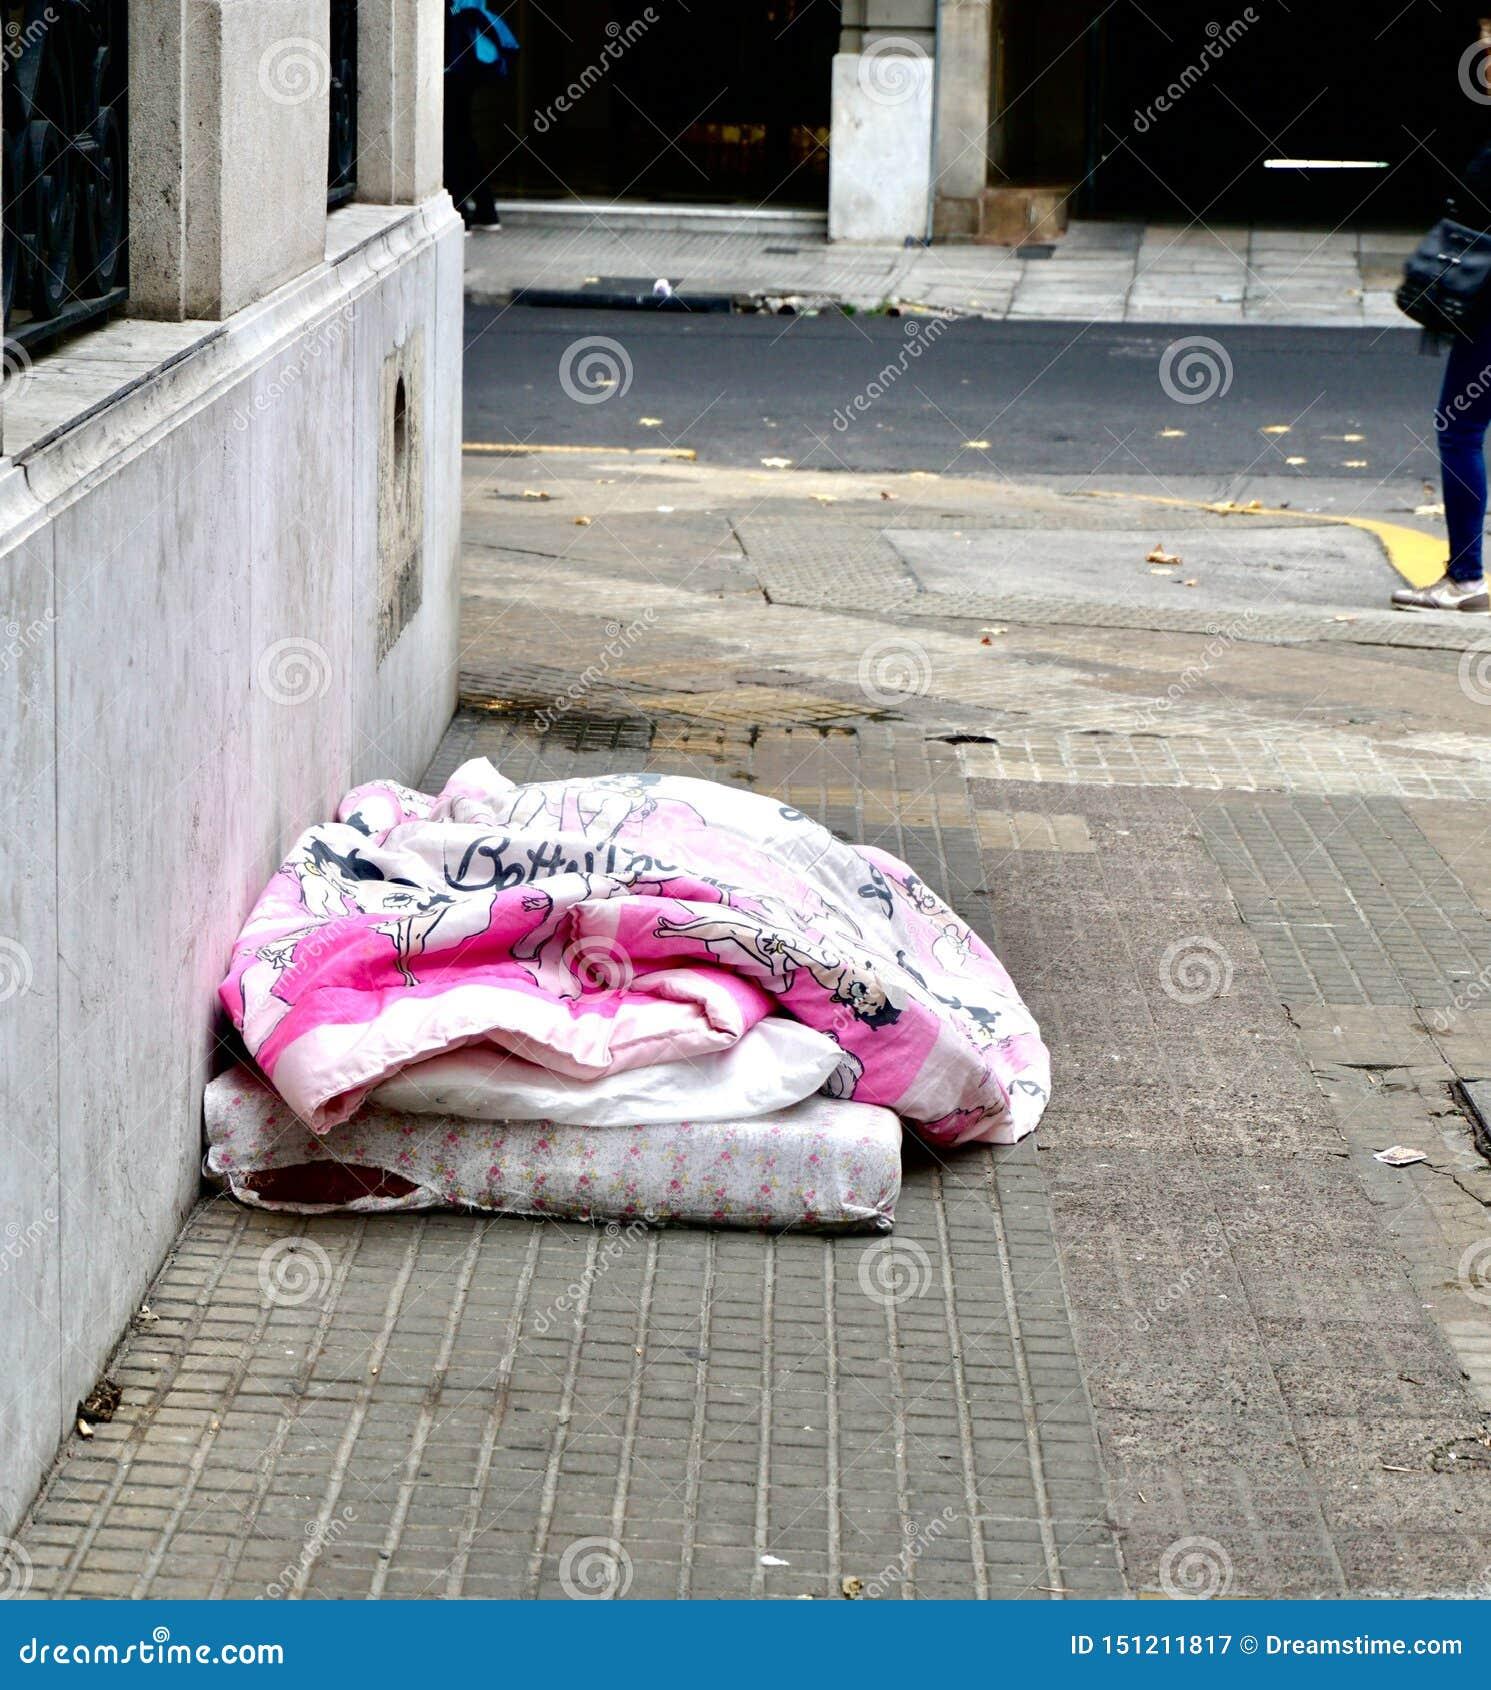 Persona sin hogar bajo cubierta rosada infantil